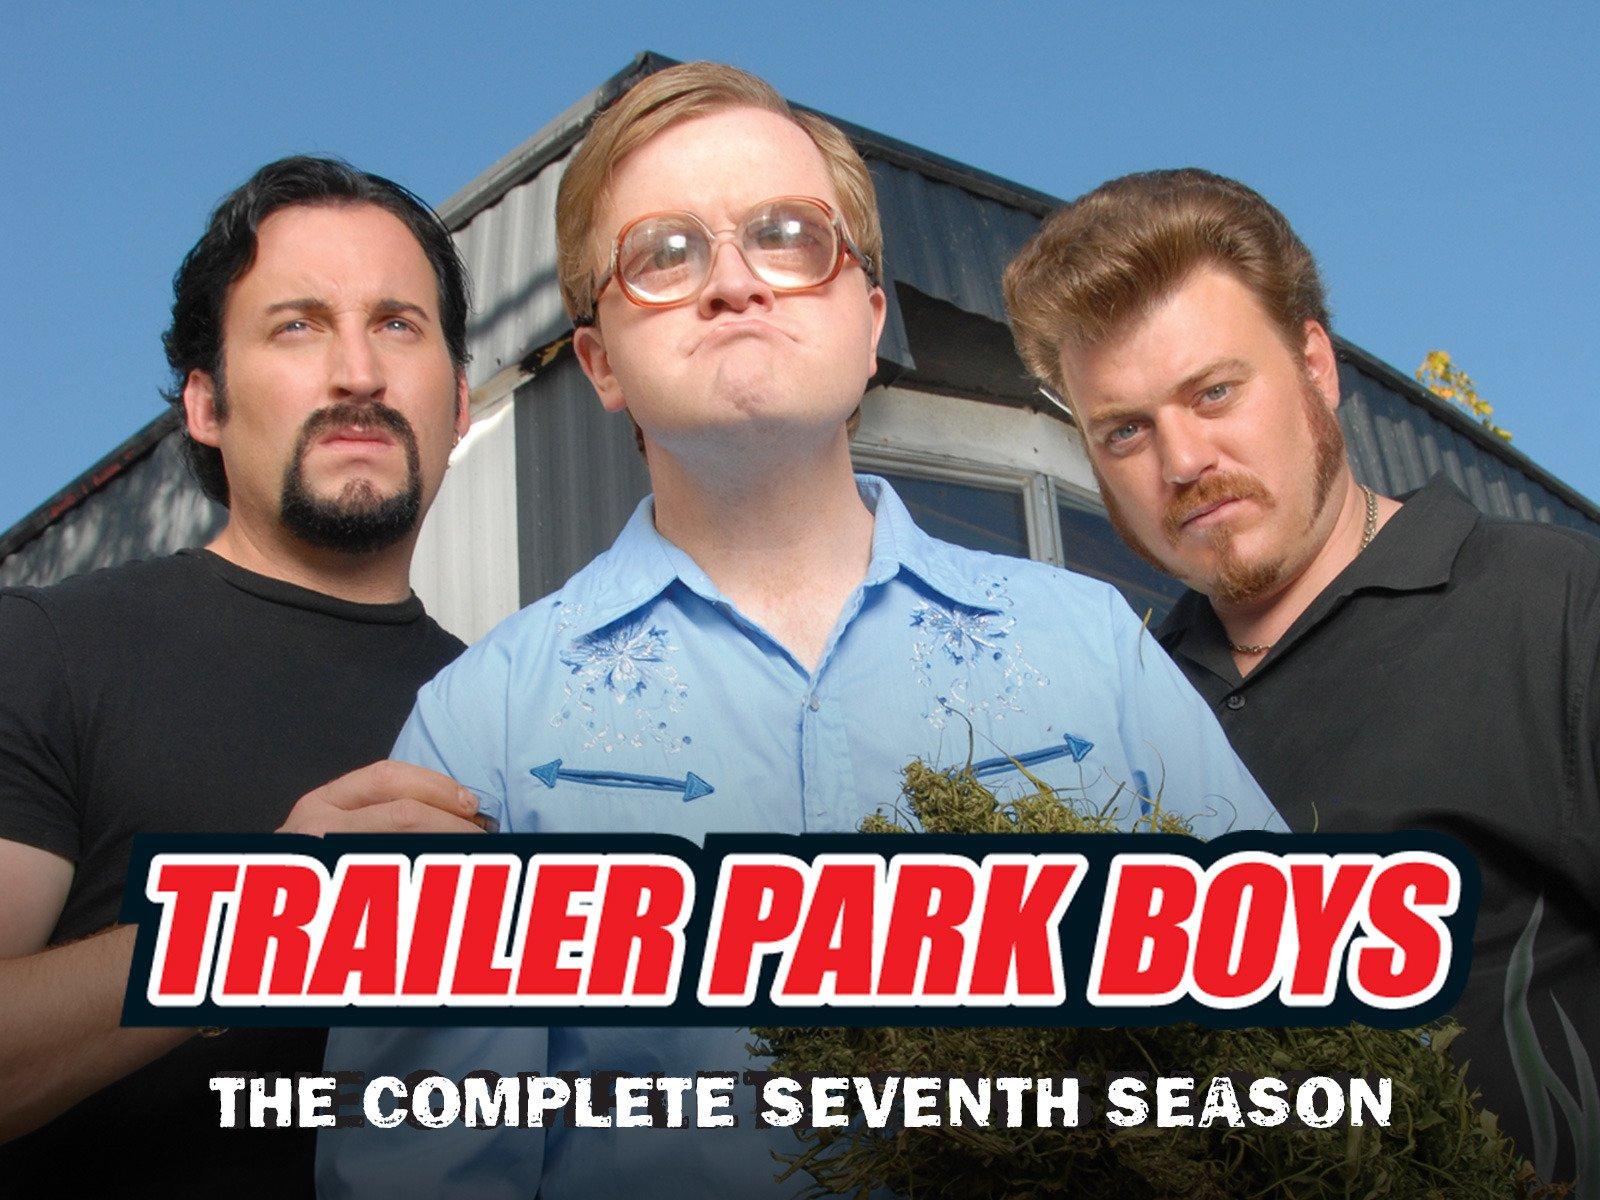 Watch Trailer Park Boys Season 7 Prime Video